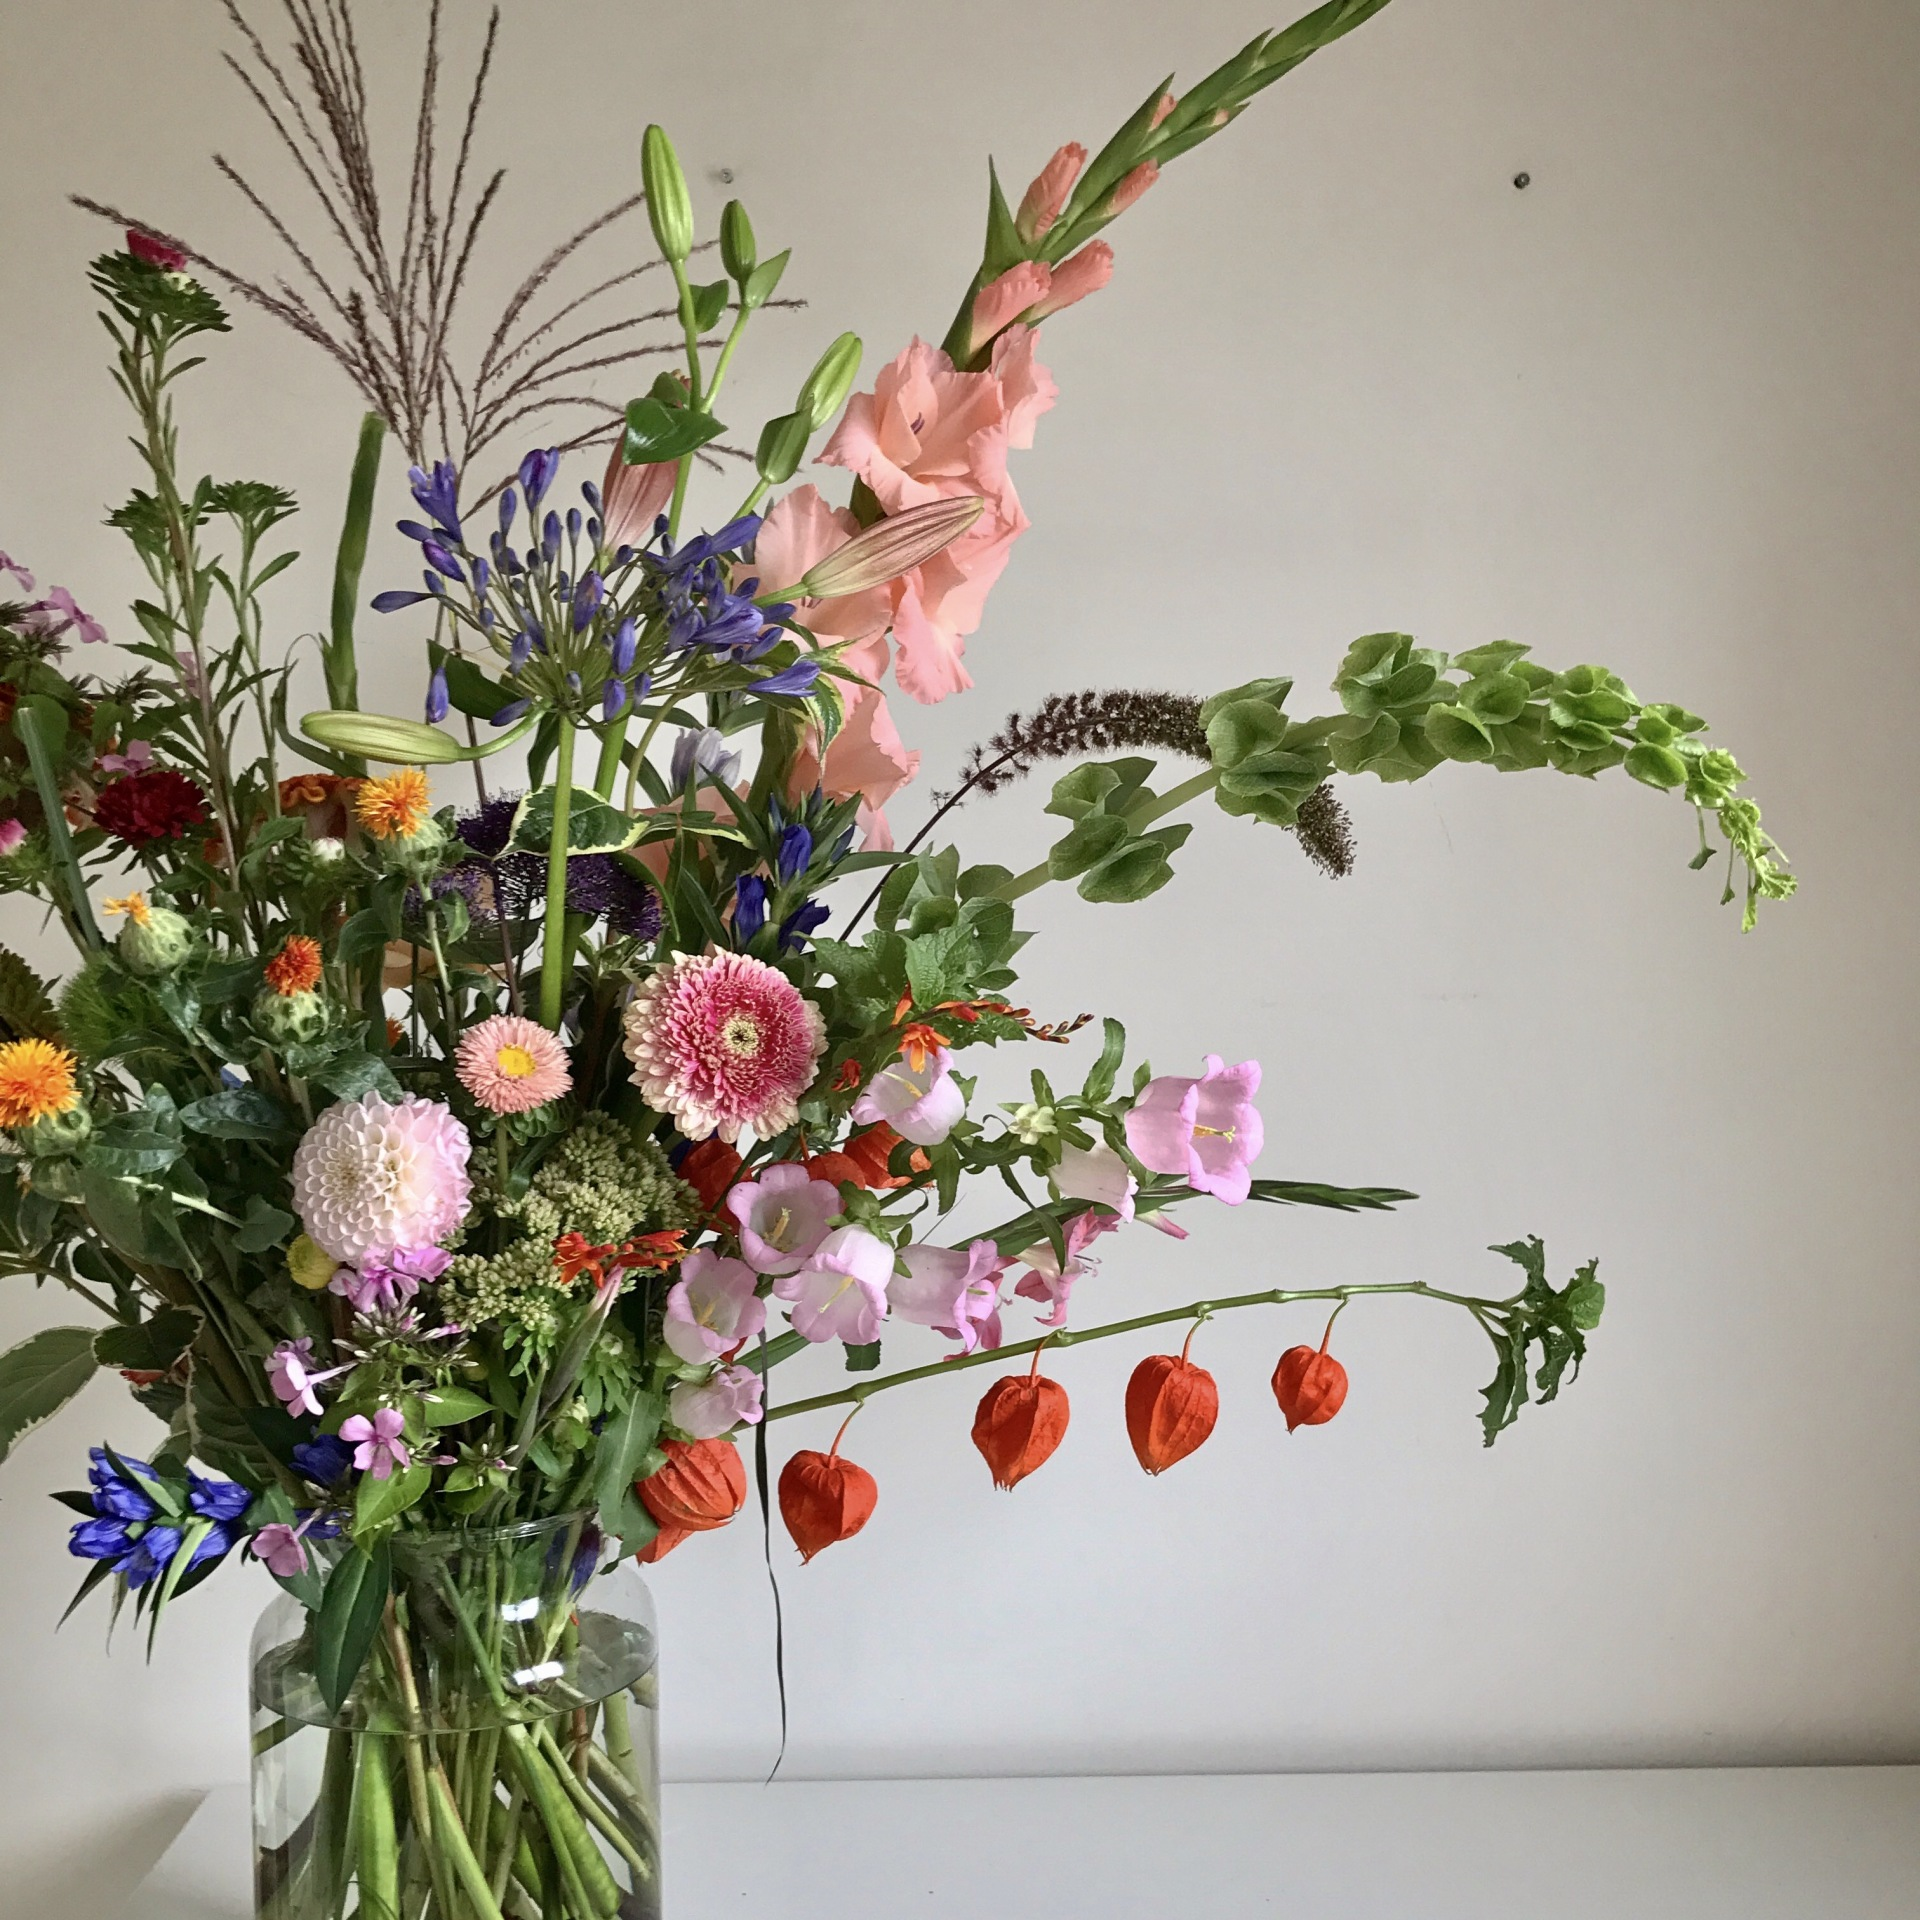 Urn arrangement | natural flowers | natural bouquet | london florist | wedding flowers | meadow flowers | wedding florist london | luxury florist | top london florist | top 10 london florist | best florist | best london florist